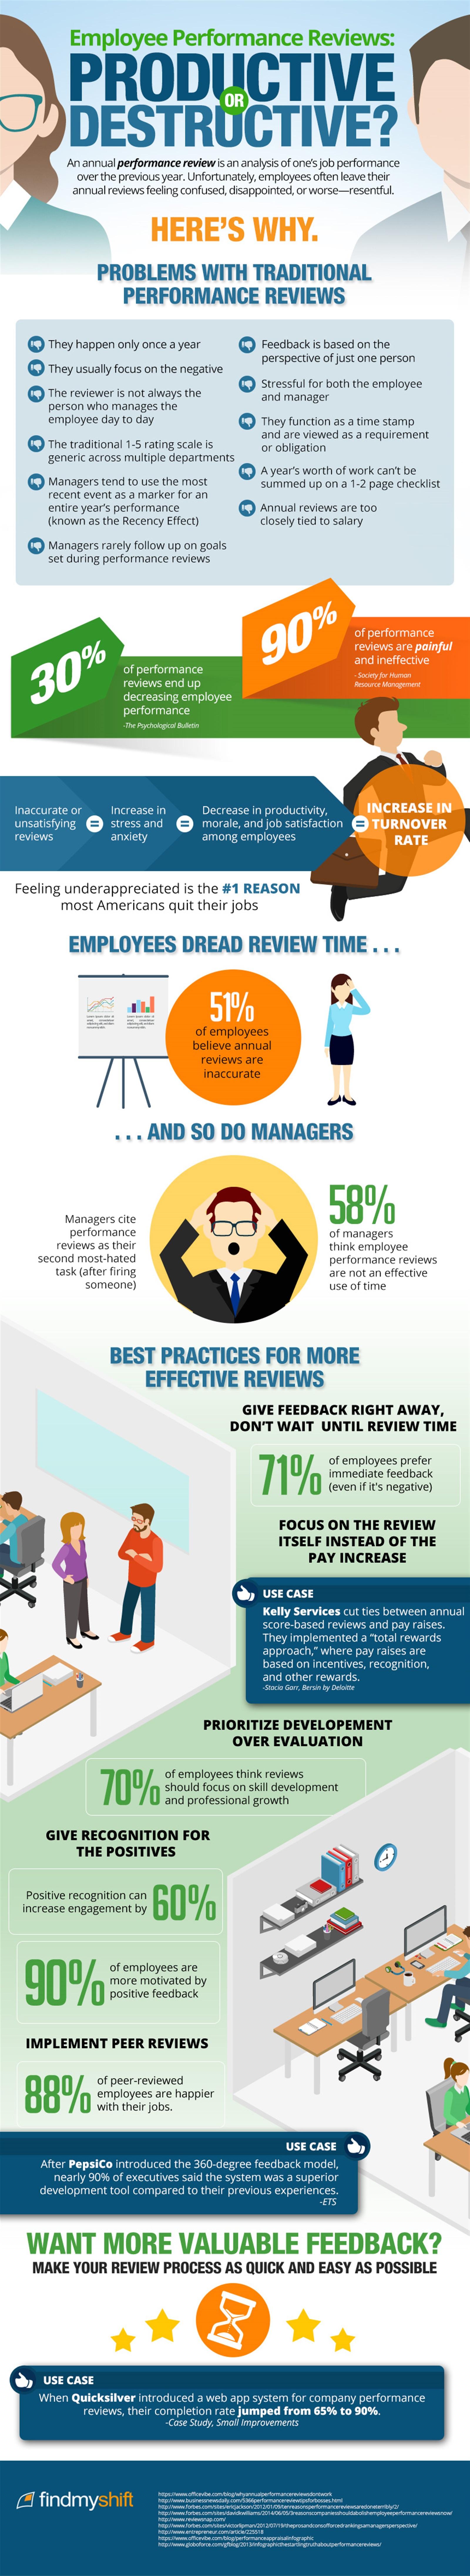 Employee Performance Reviews: Productive Or Destructive?